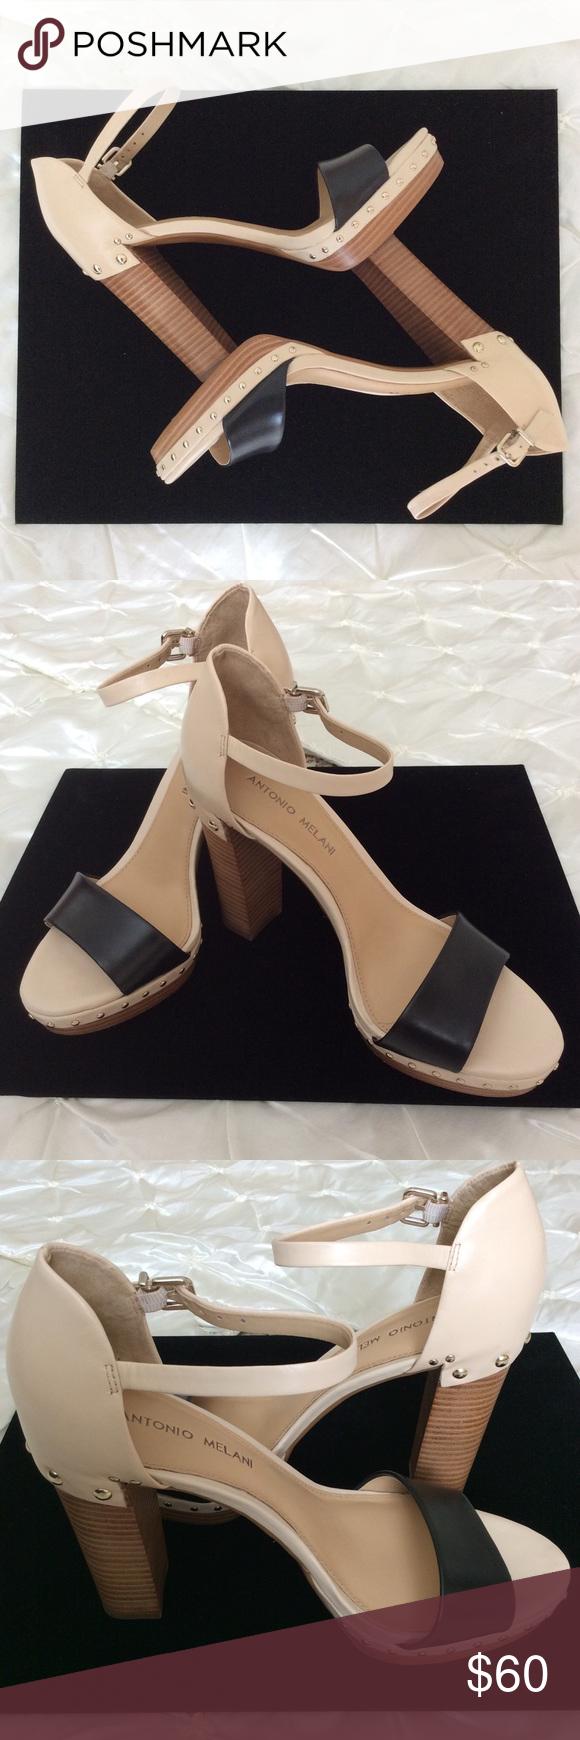 19bca2b6cfa HP ANTONIO MELANI Black   Pink Leather Strap Heels Beautiful light tannish light  pink with black strap leather heels by Antonio Melani!